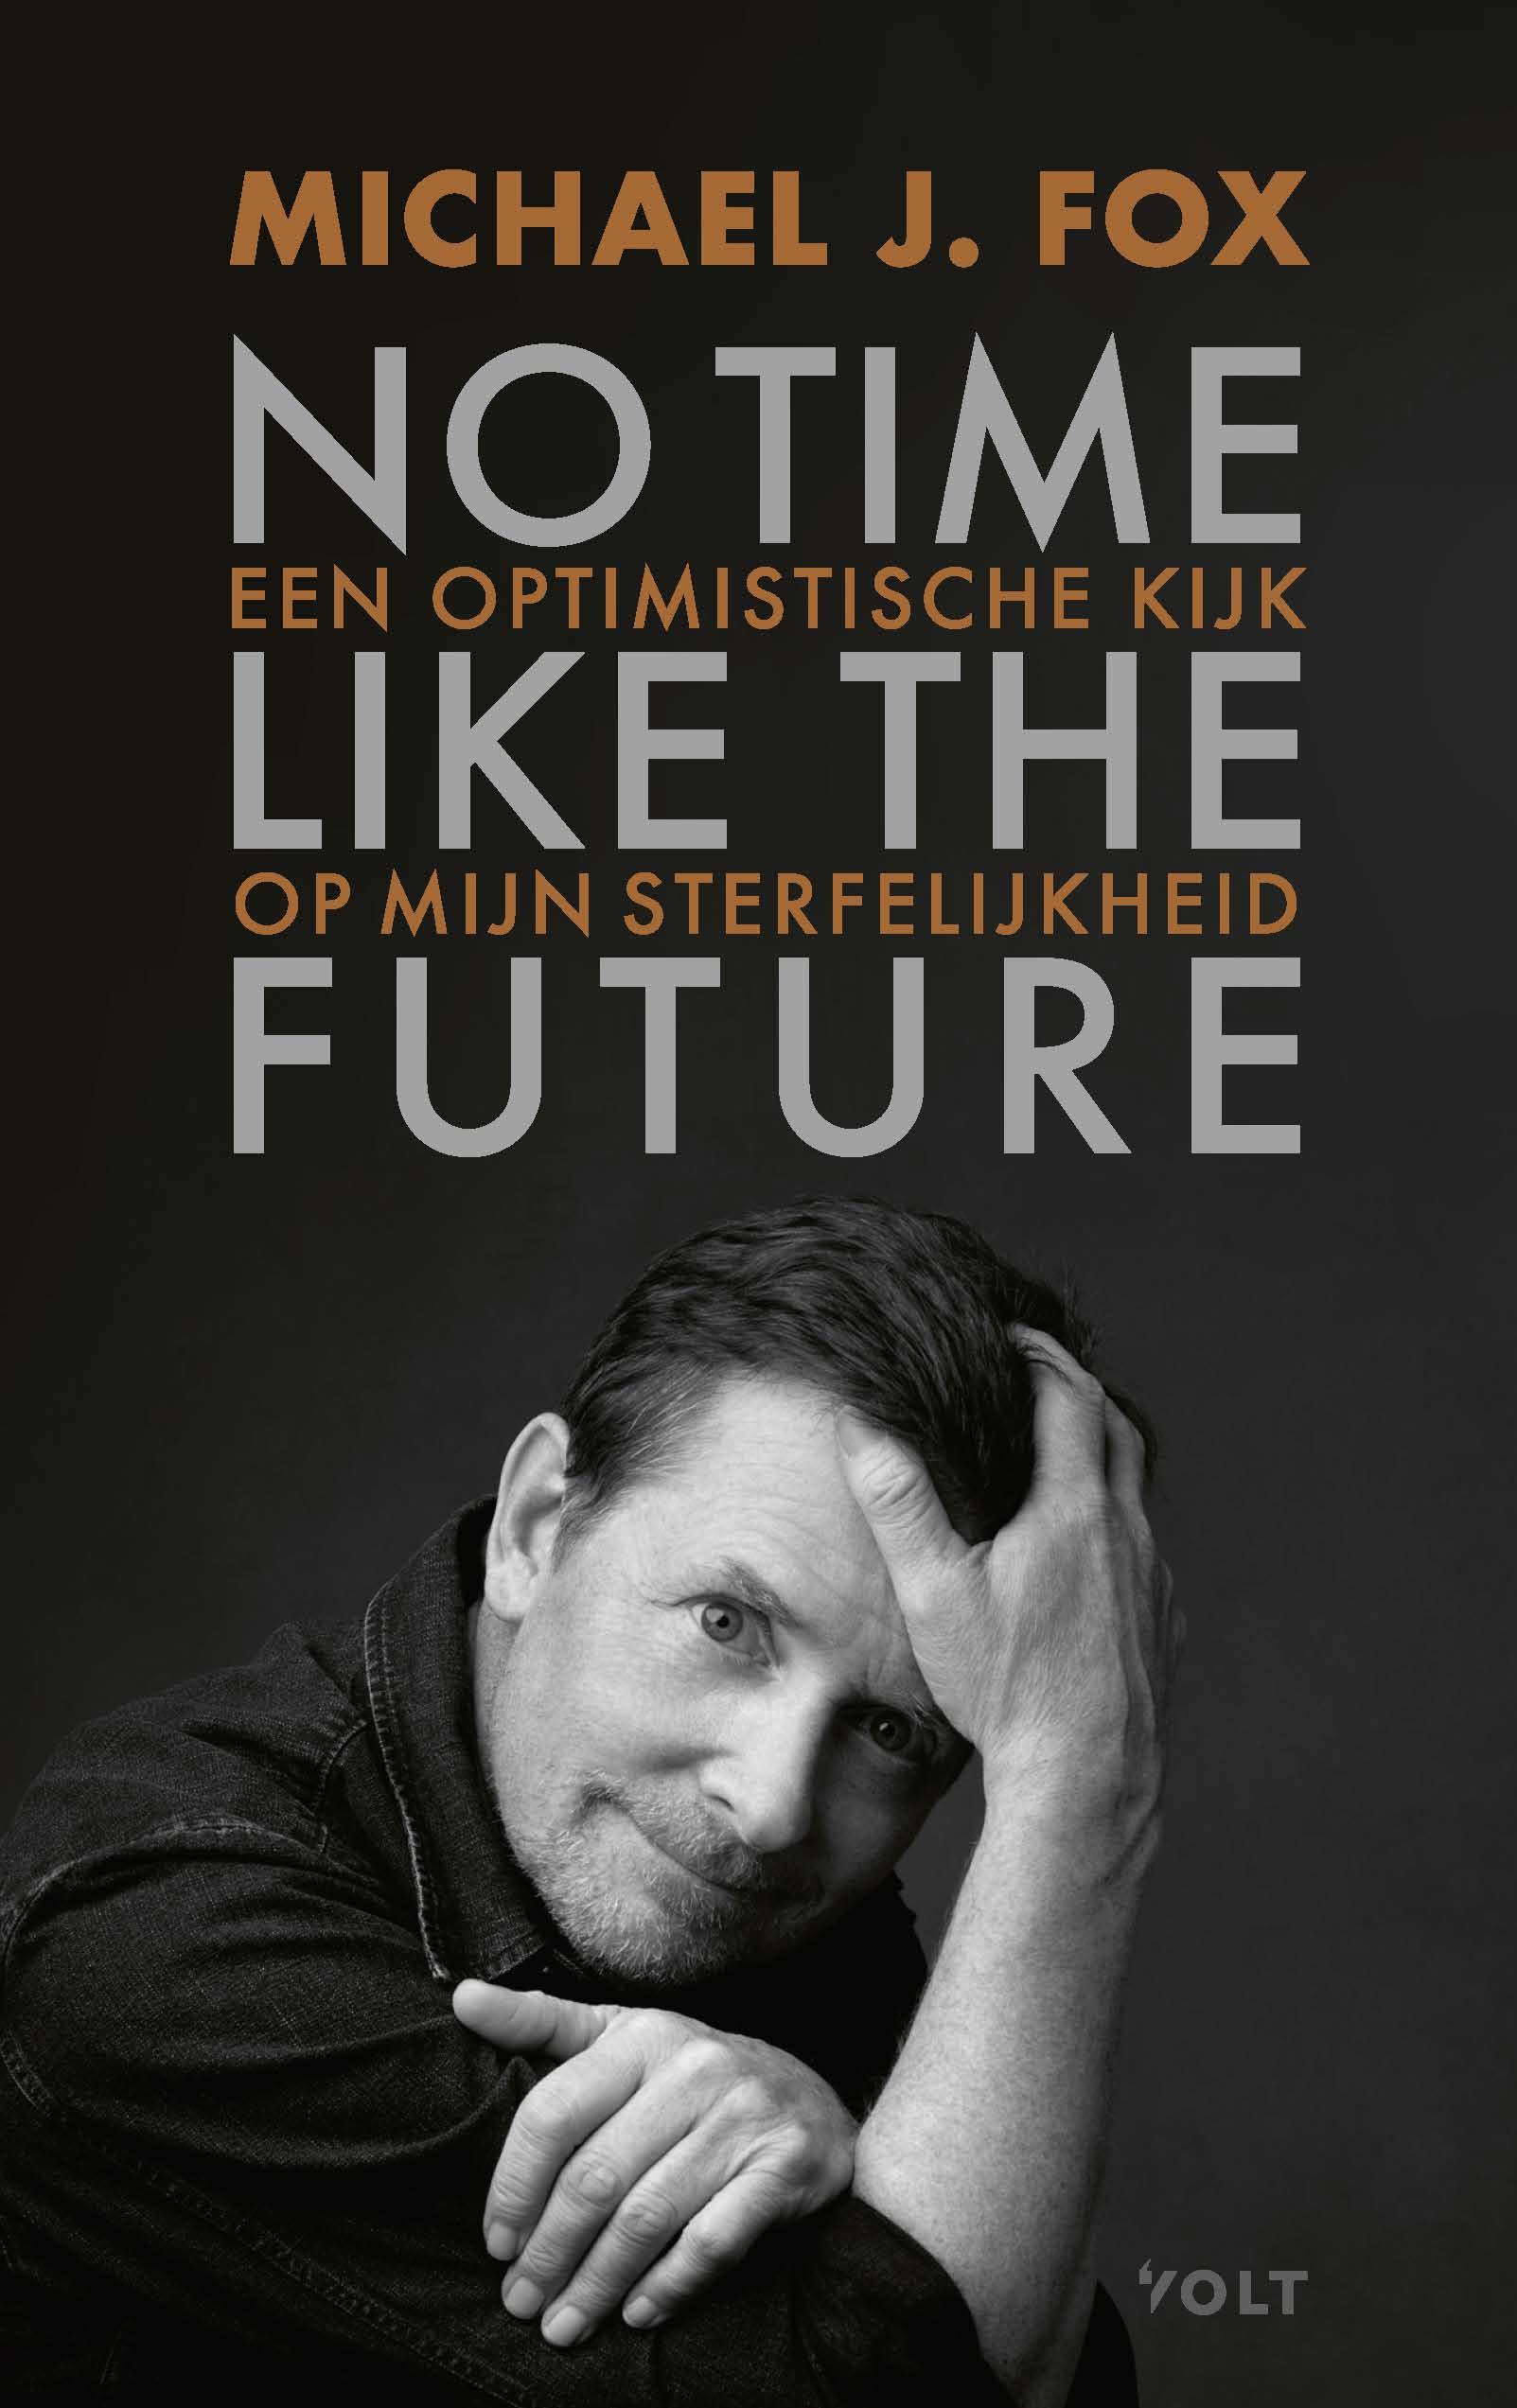 No time like the future - boekenflits